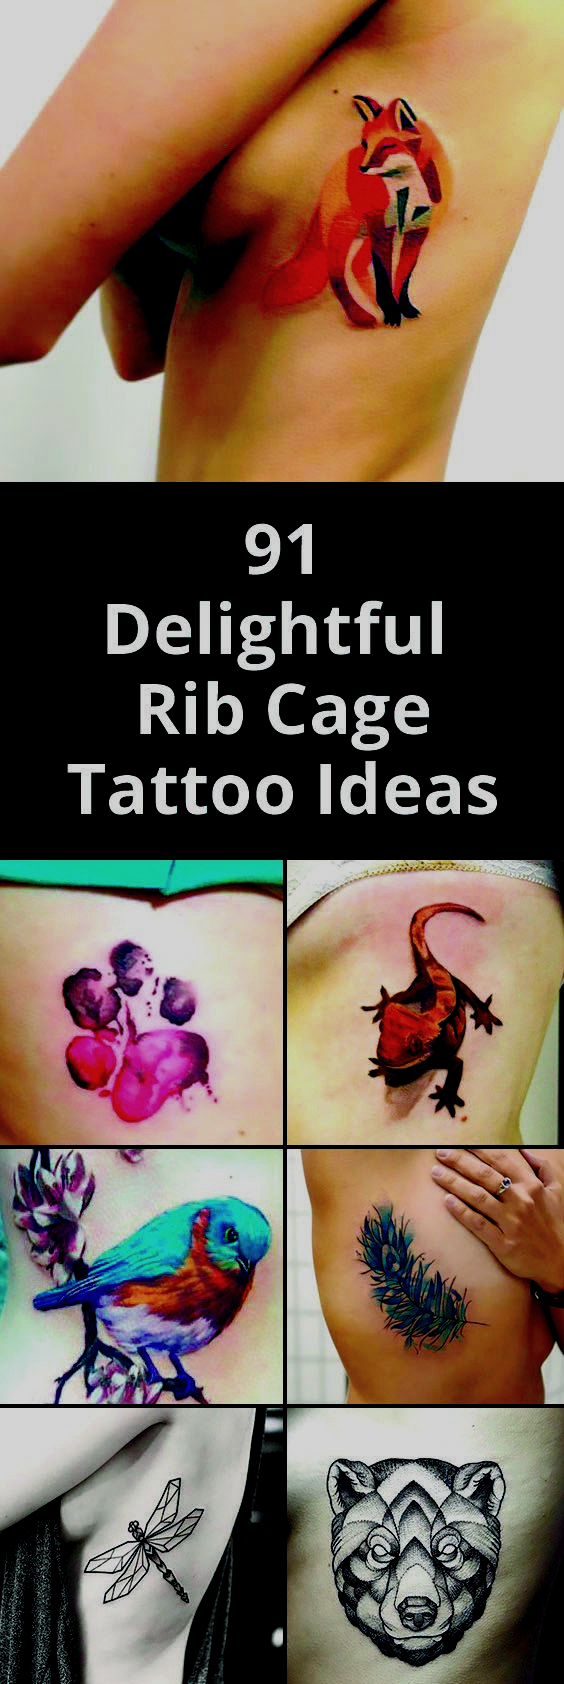 91 Delightful Rib Cage Tattoo Ideas